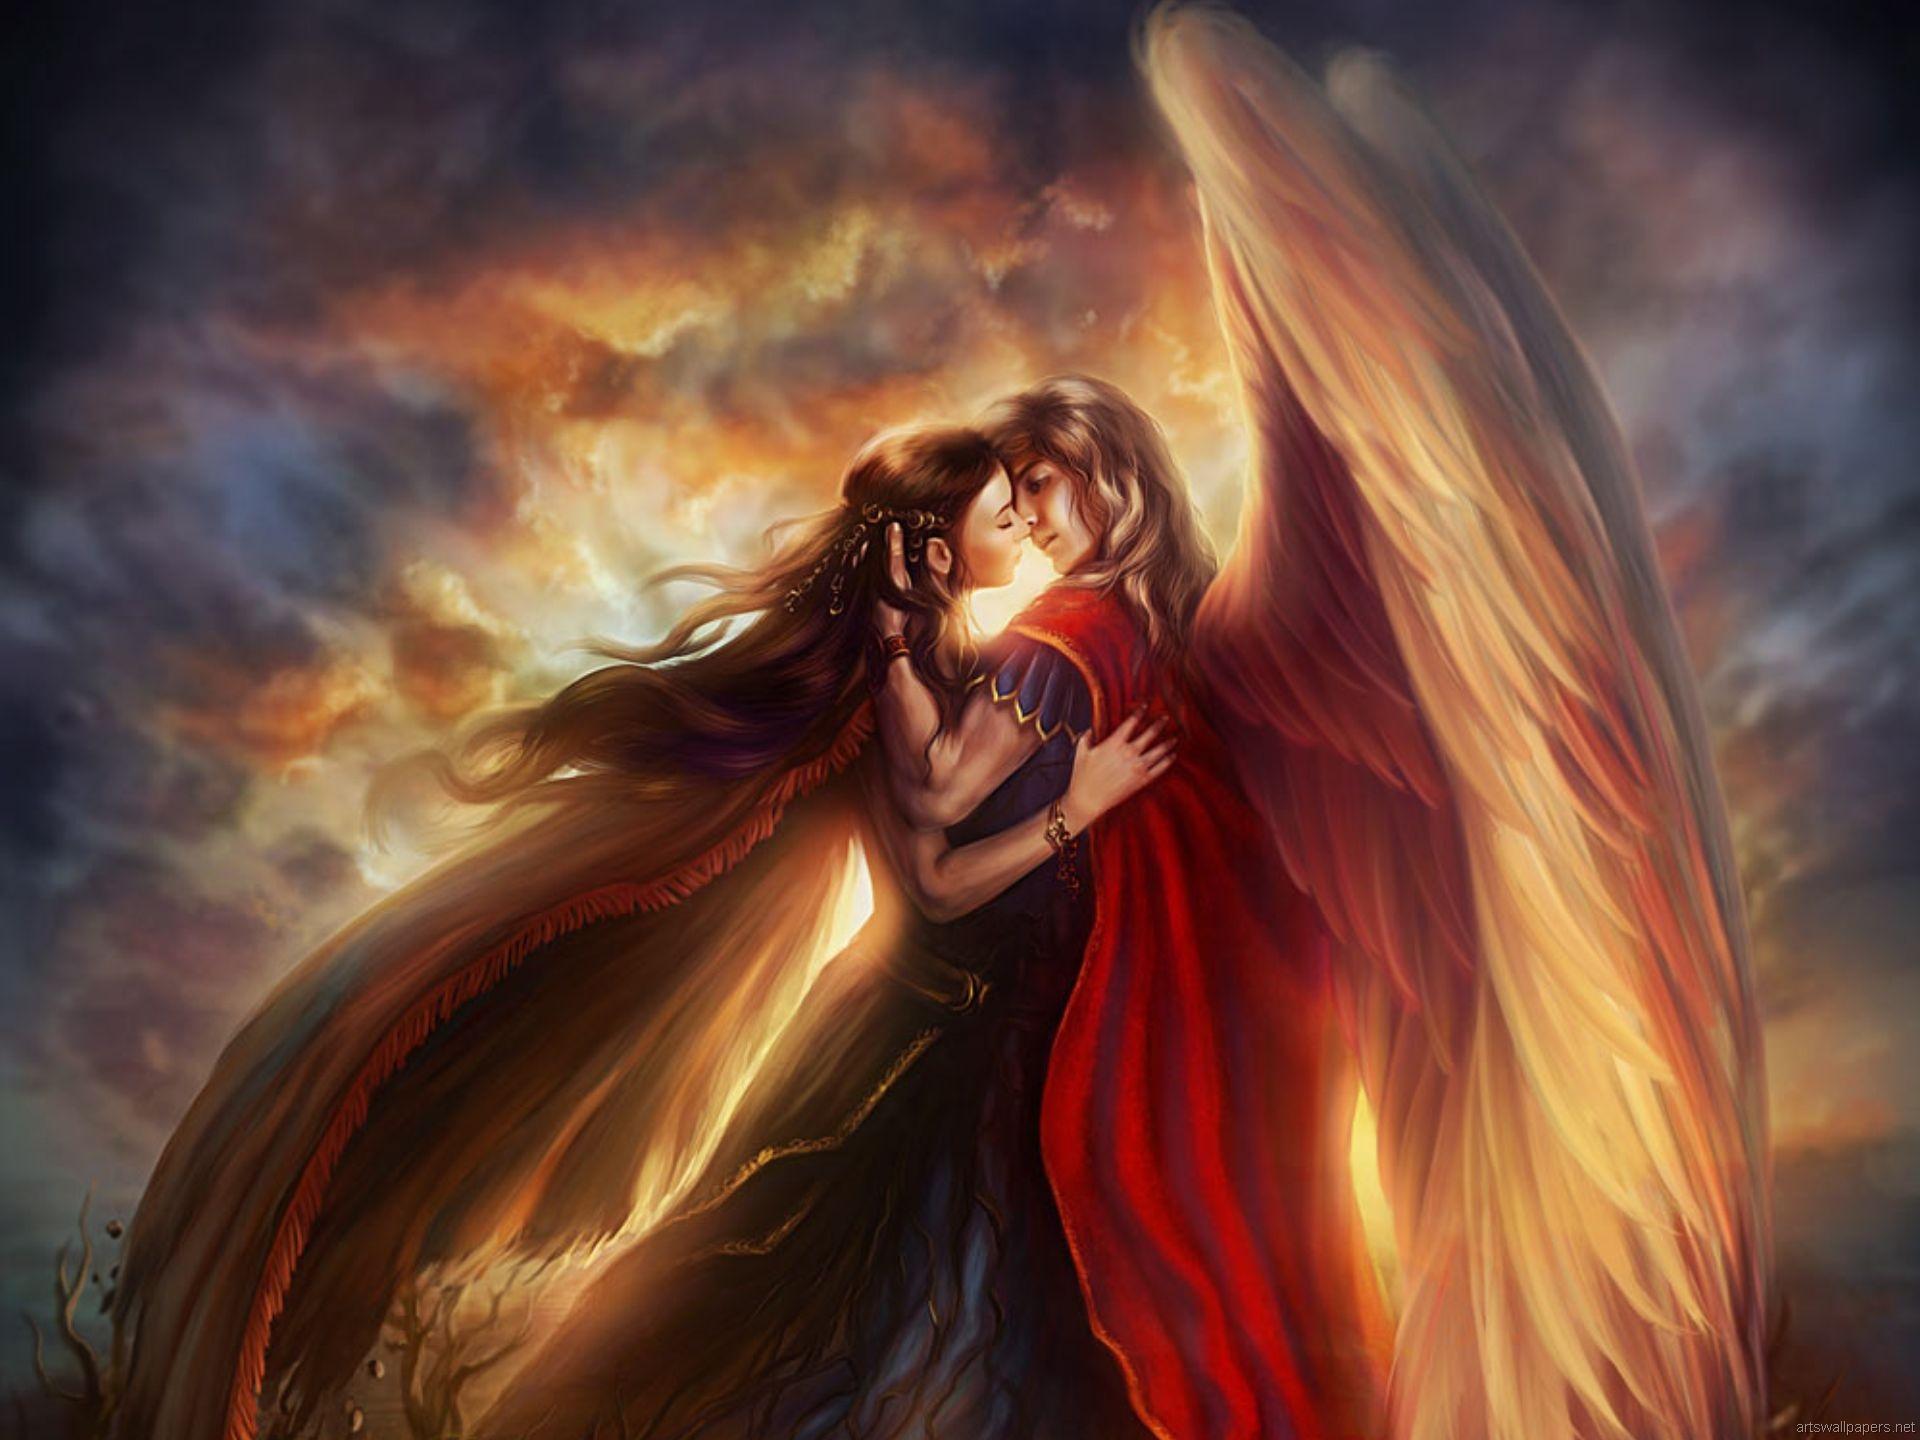 Фэнтези - Ангел  Любовь Love Of An Angel Обои